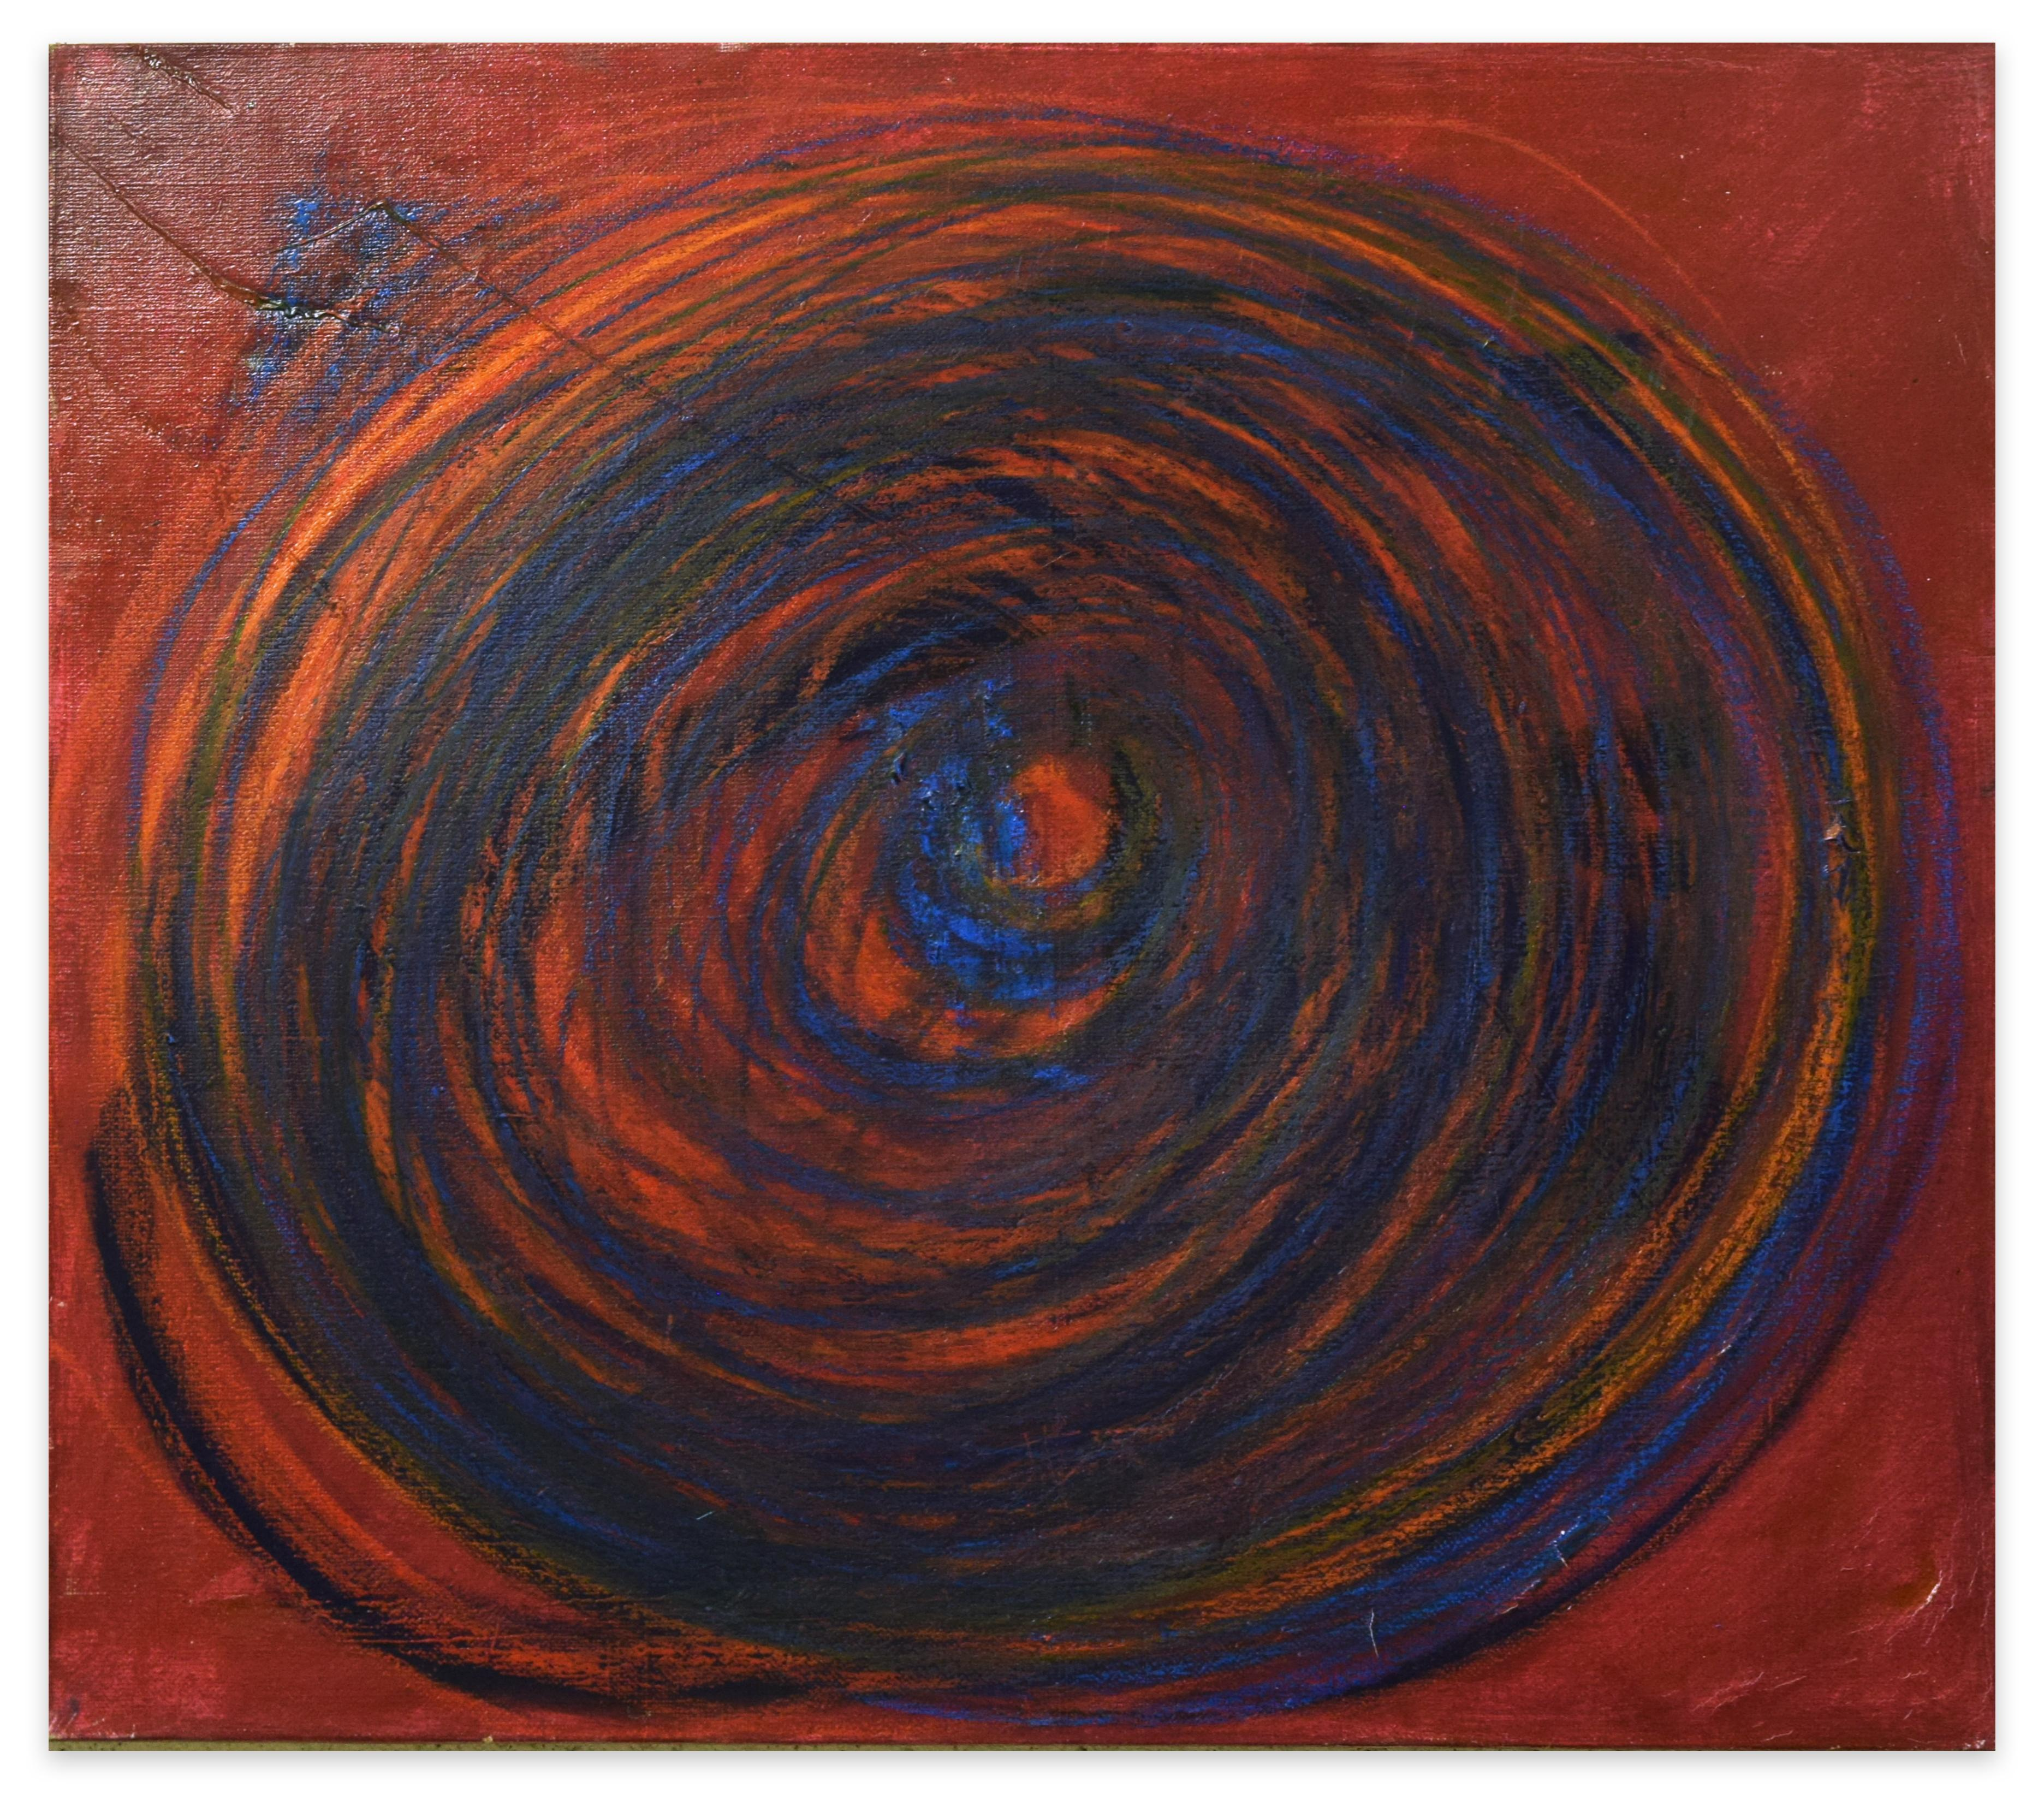 Eclipse - Oil Painting 2016 by Giorgio Lo Fermo